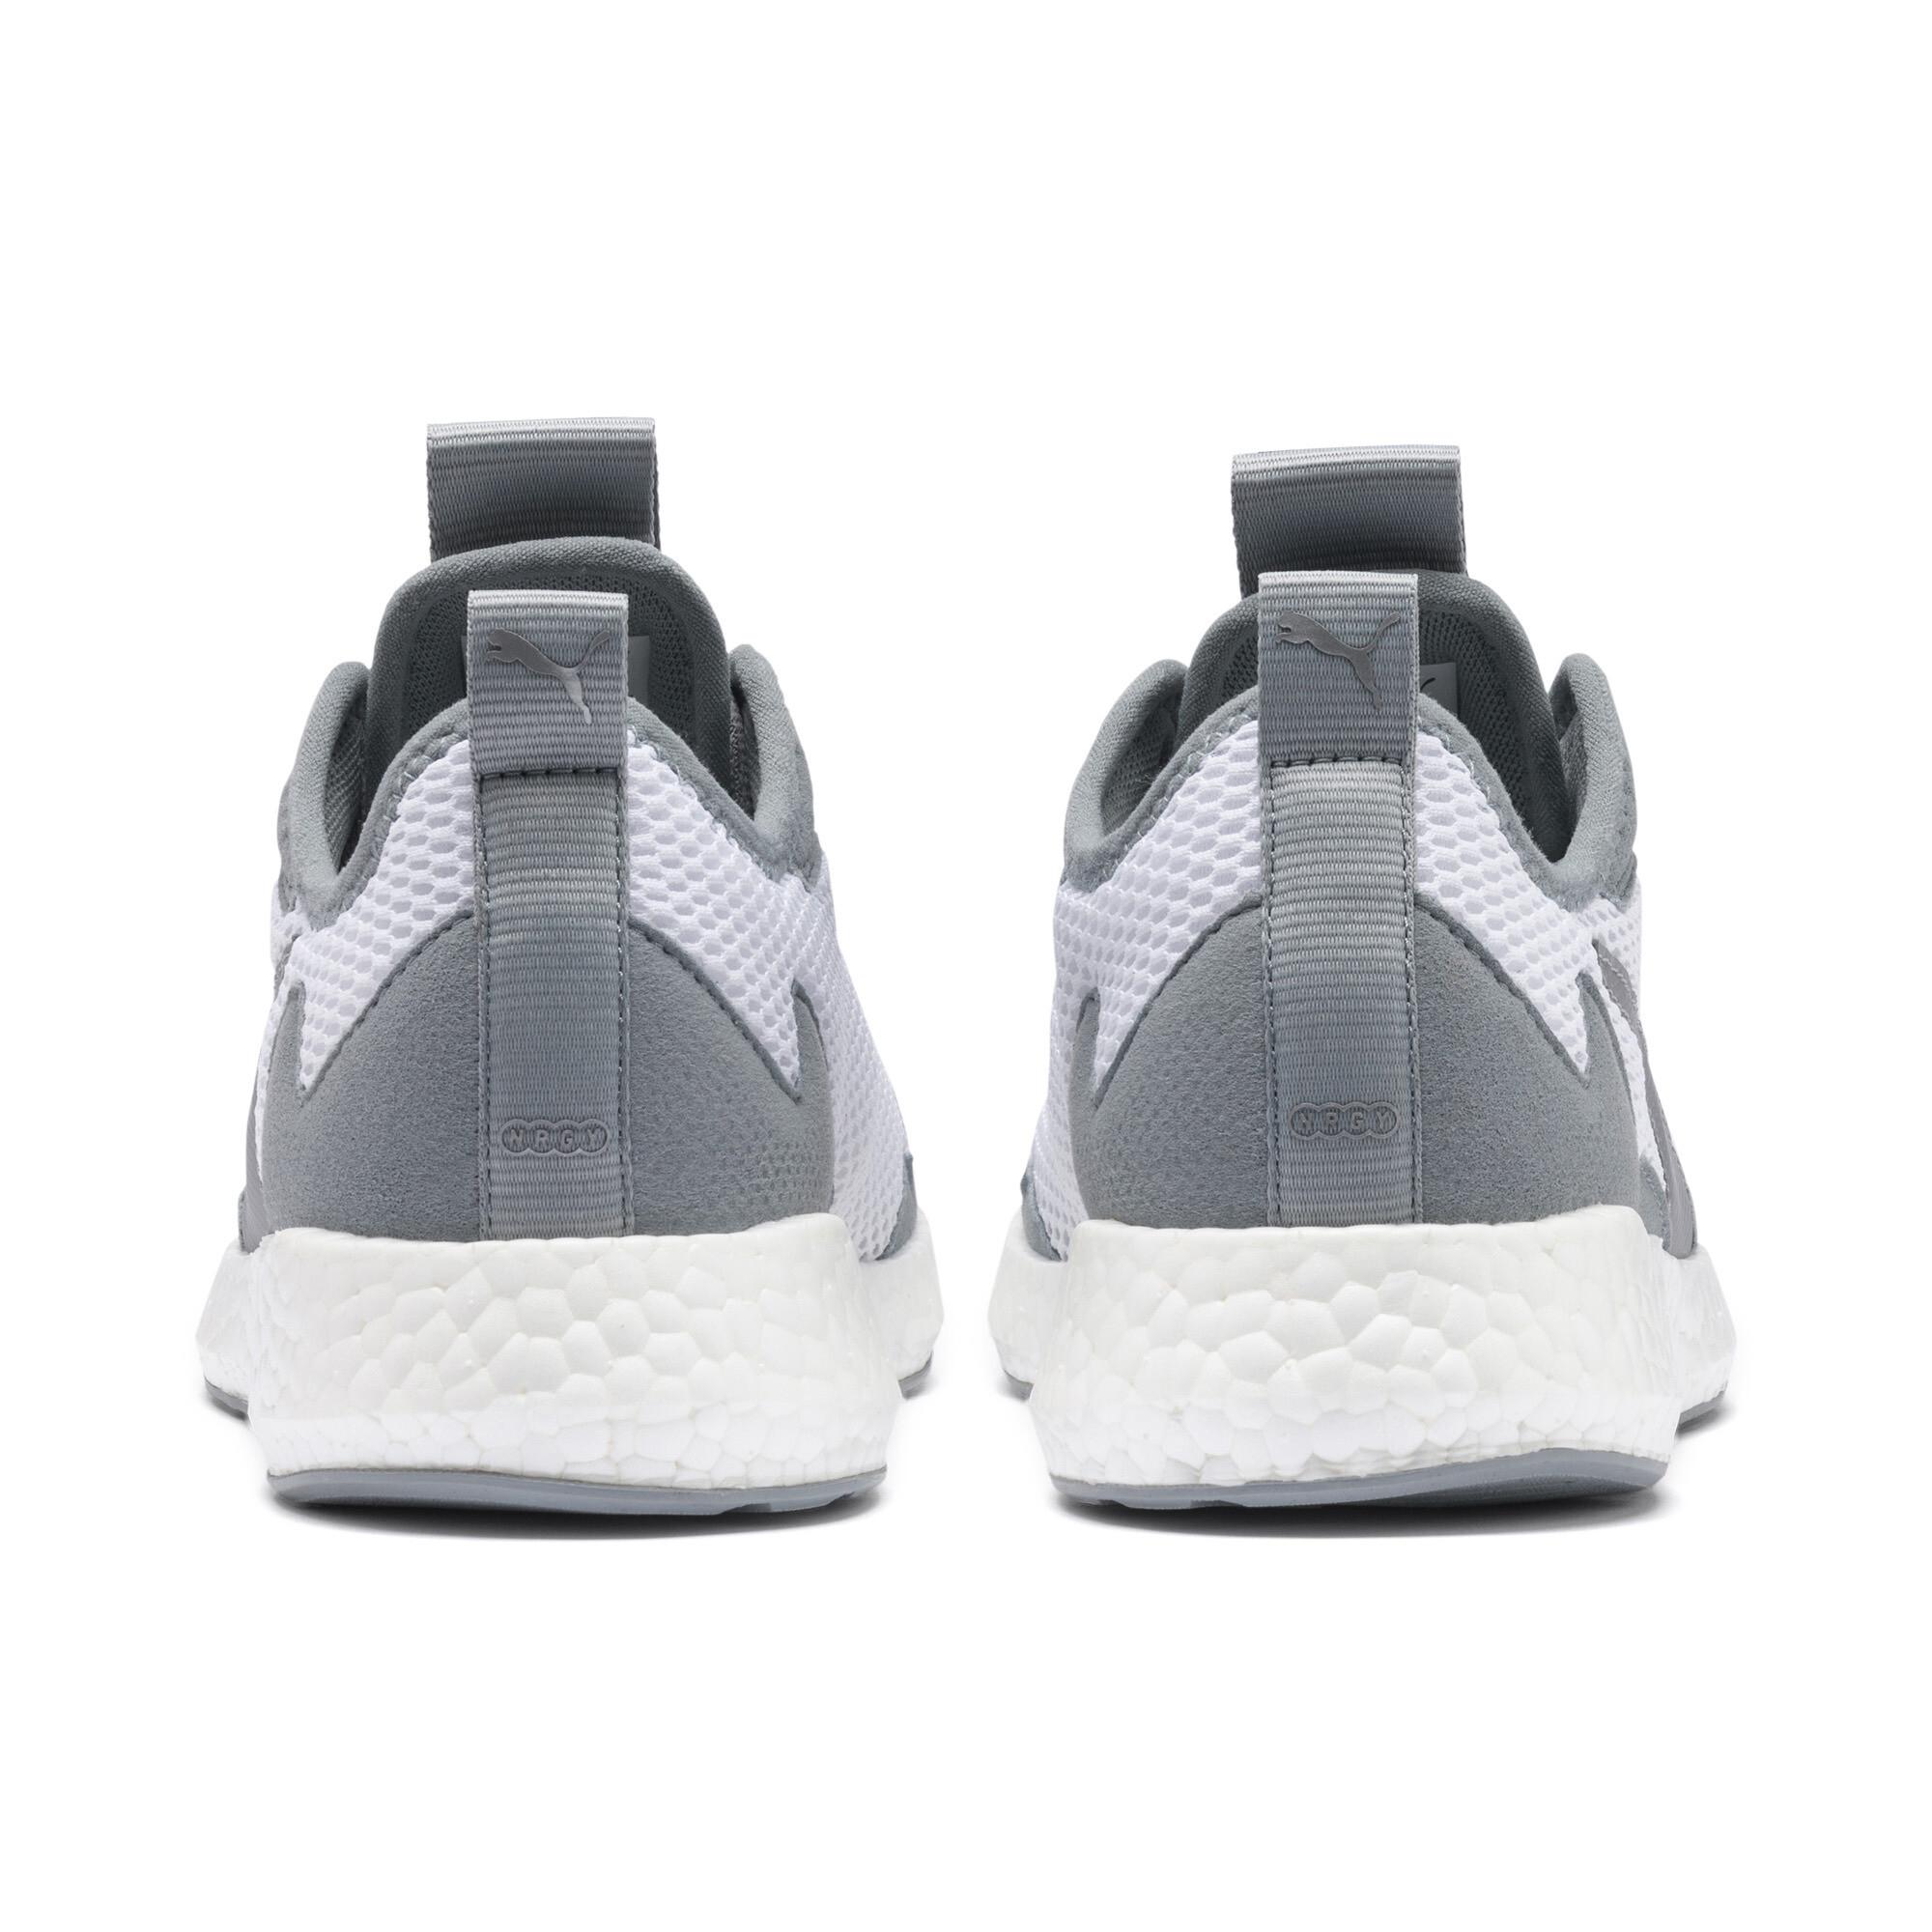 PUMA-Women-039-s-NRGY-Neko-Skim-Running-Shoes thumbnail 3